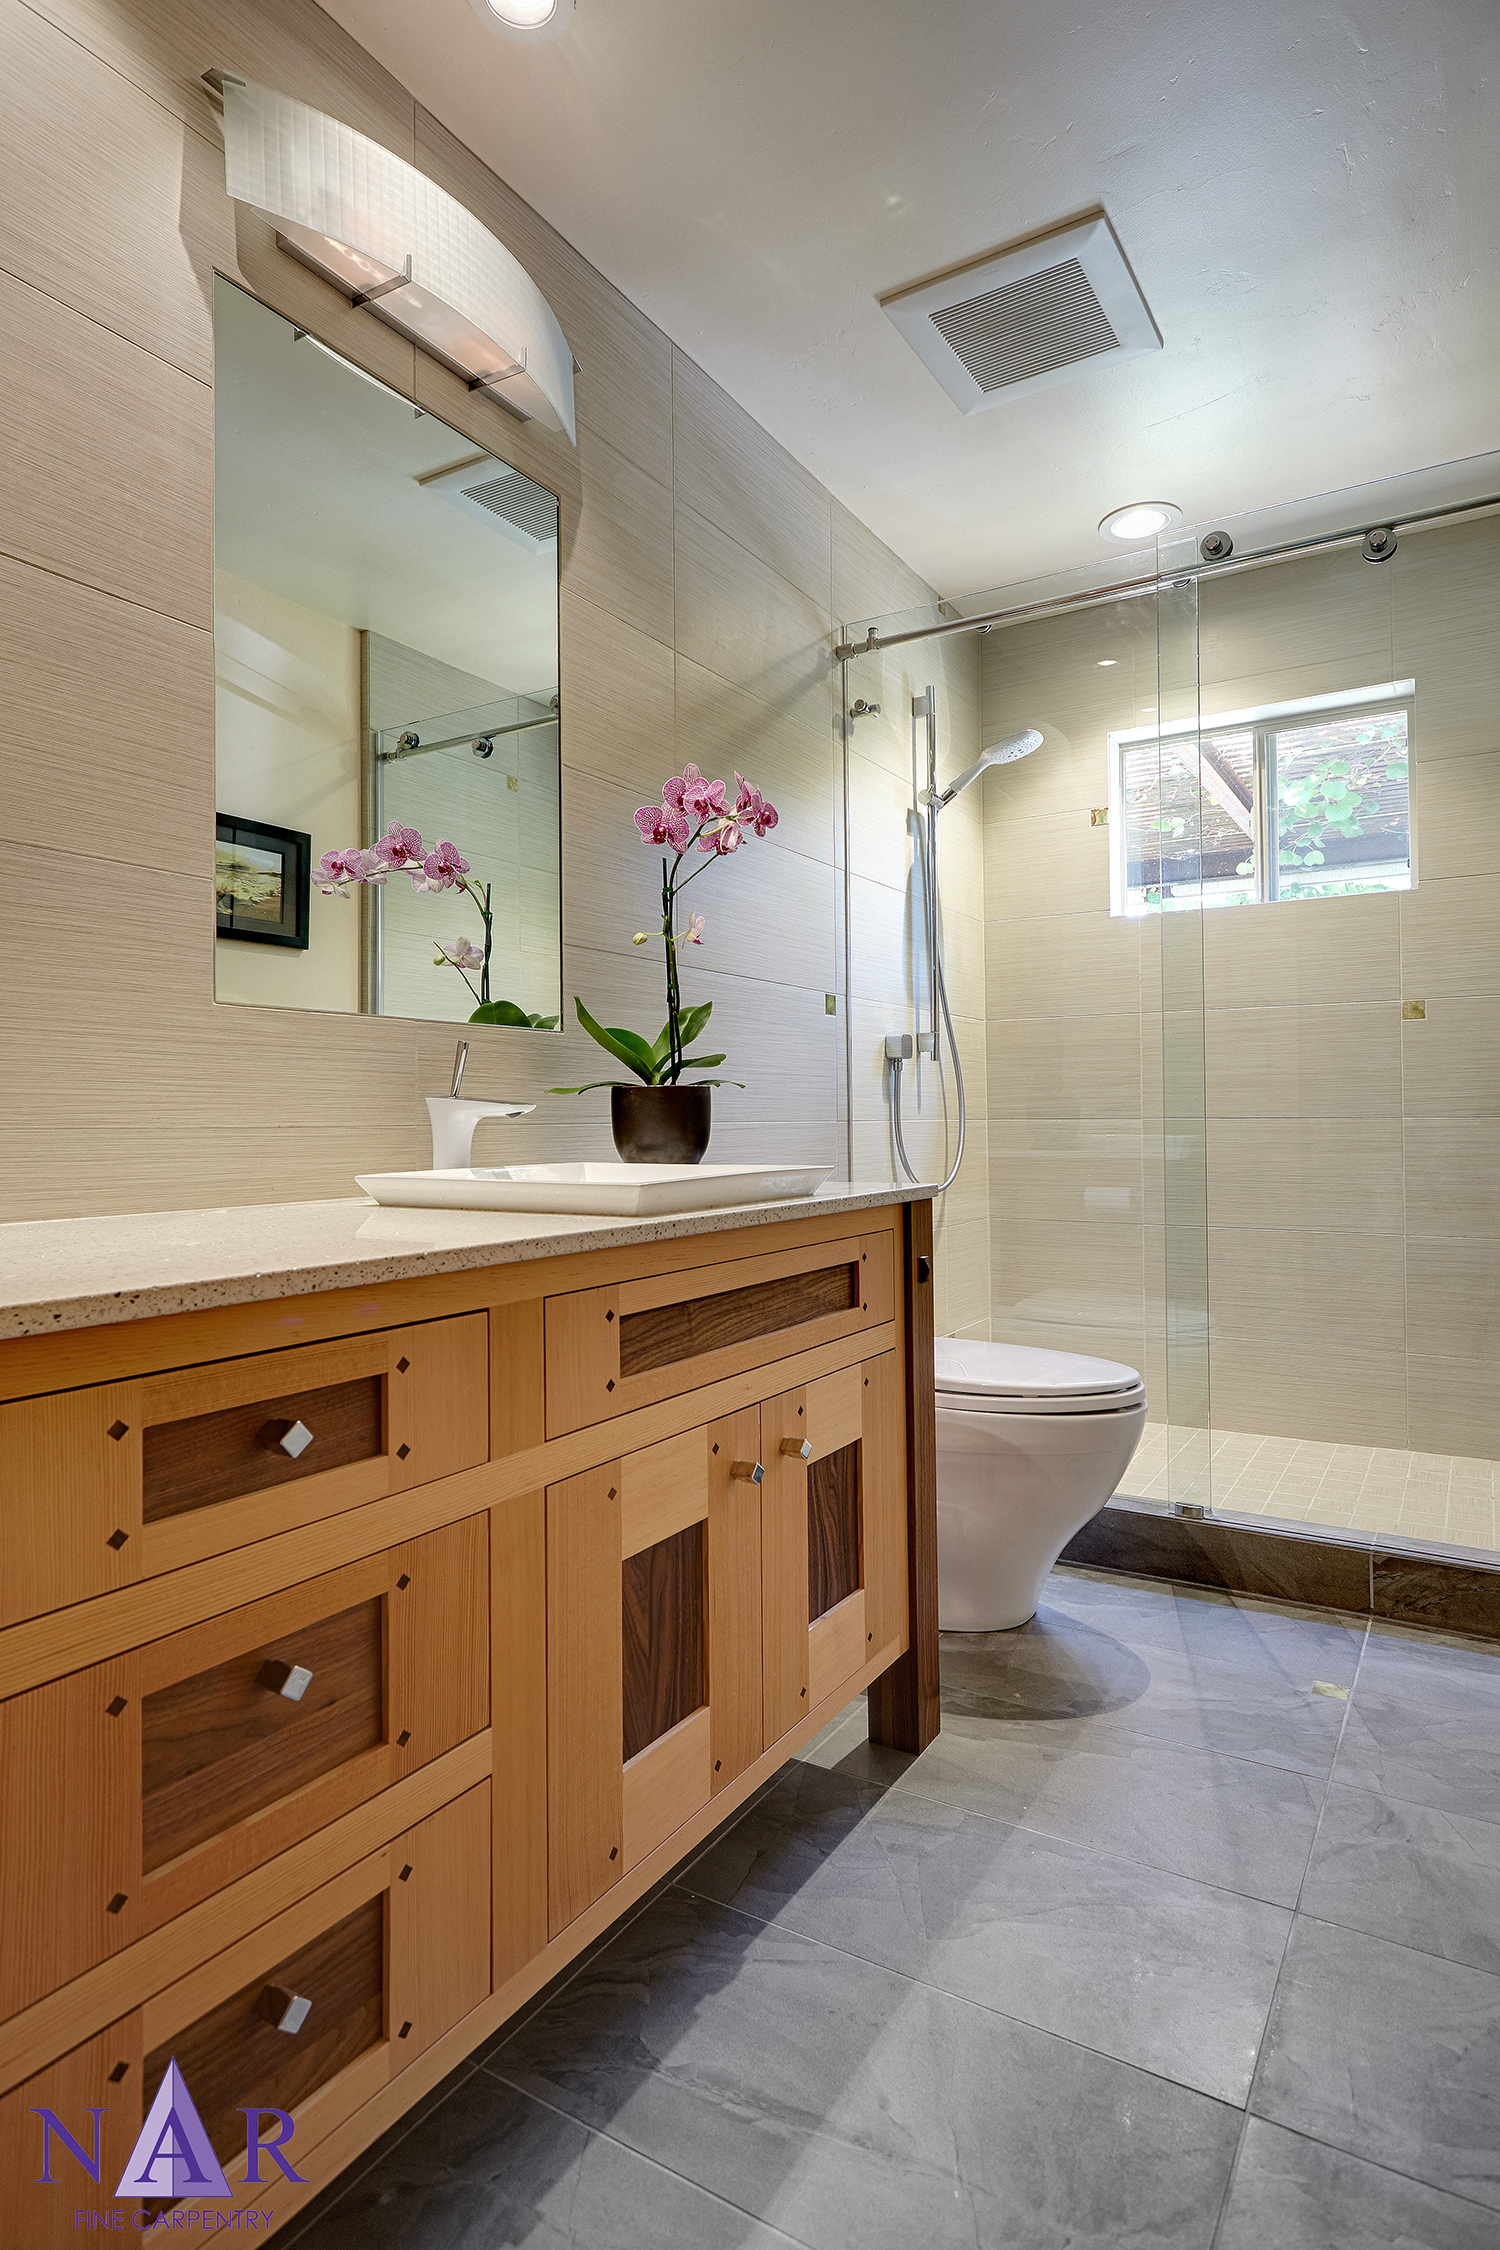 Carmichael Zen Bath. Nar Fine Carpentry. Sacramento. El Dorado Hills